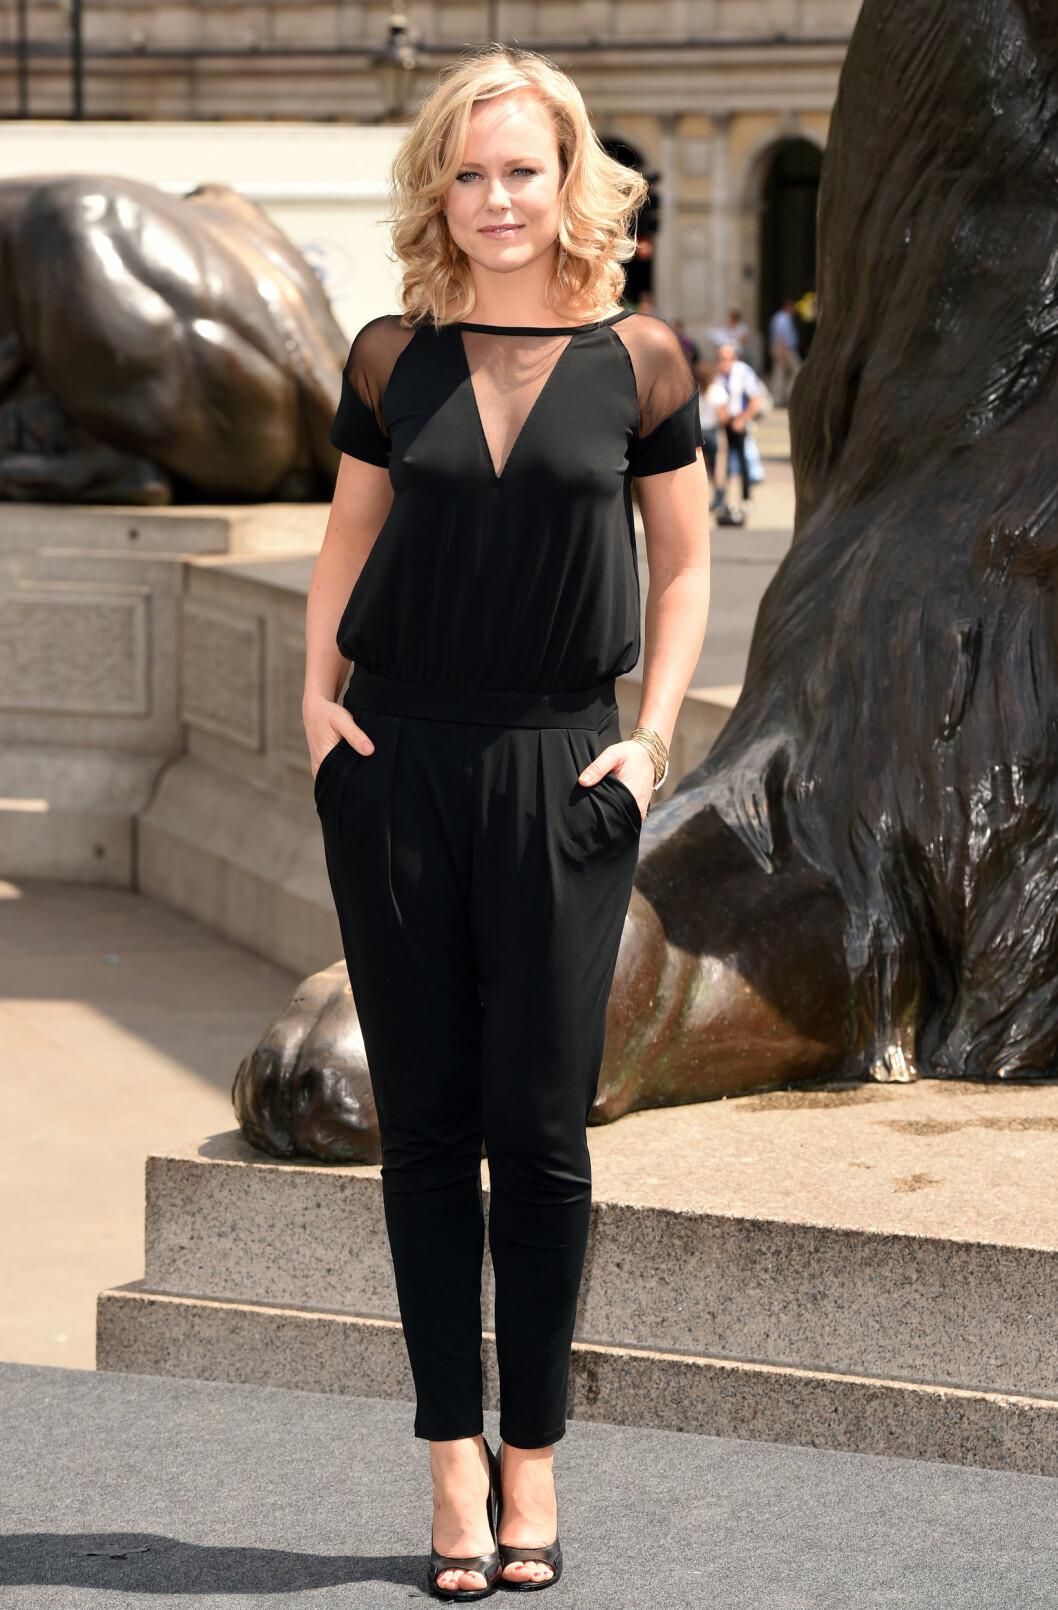 I LONDON: Da Herclues-teamet skulle promotere den kommende filmen, hadde Berdal valgt en en sort, sexy jumpsuit. Det enkle designet ble interessant og hakket frekkere med de transparente partiene. Foto: All Over Press